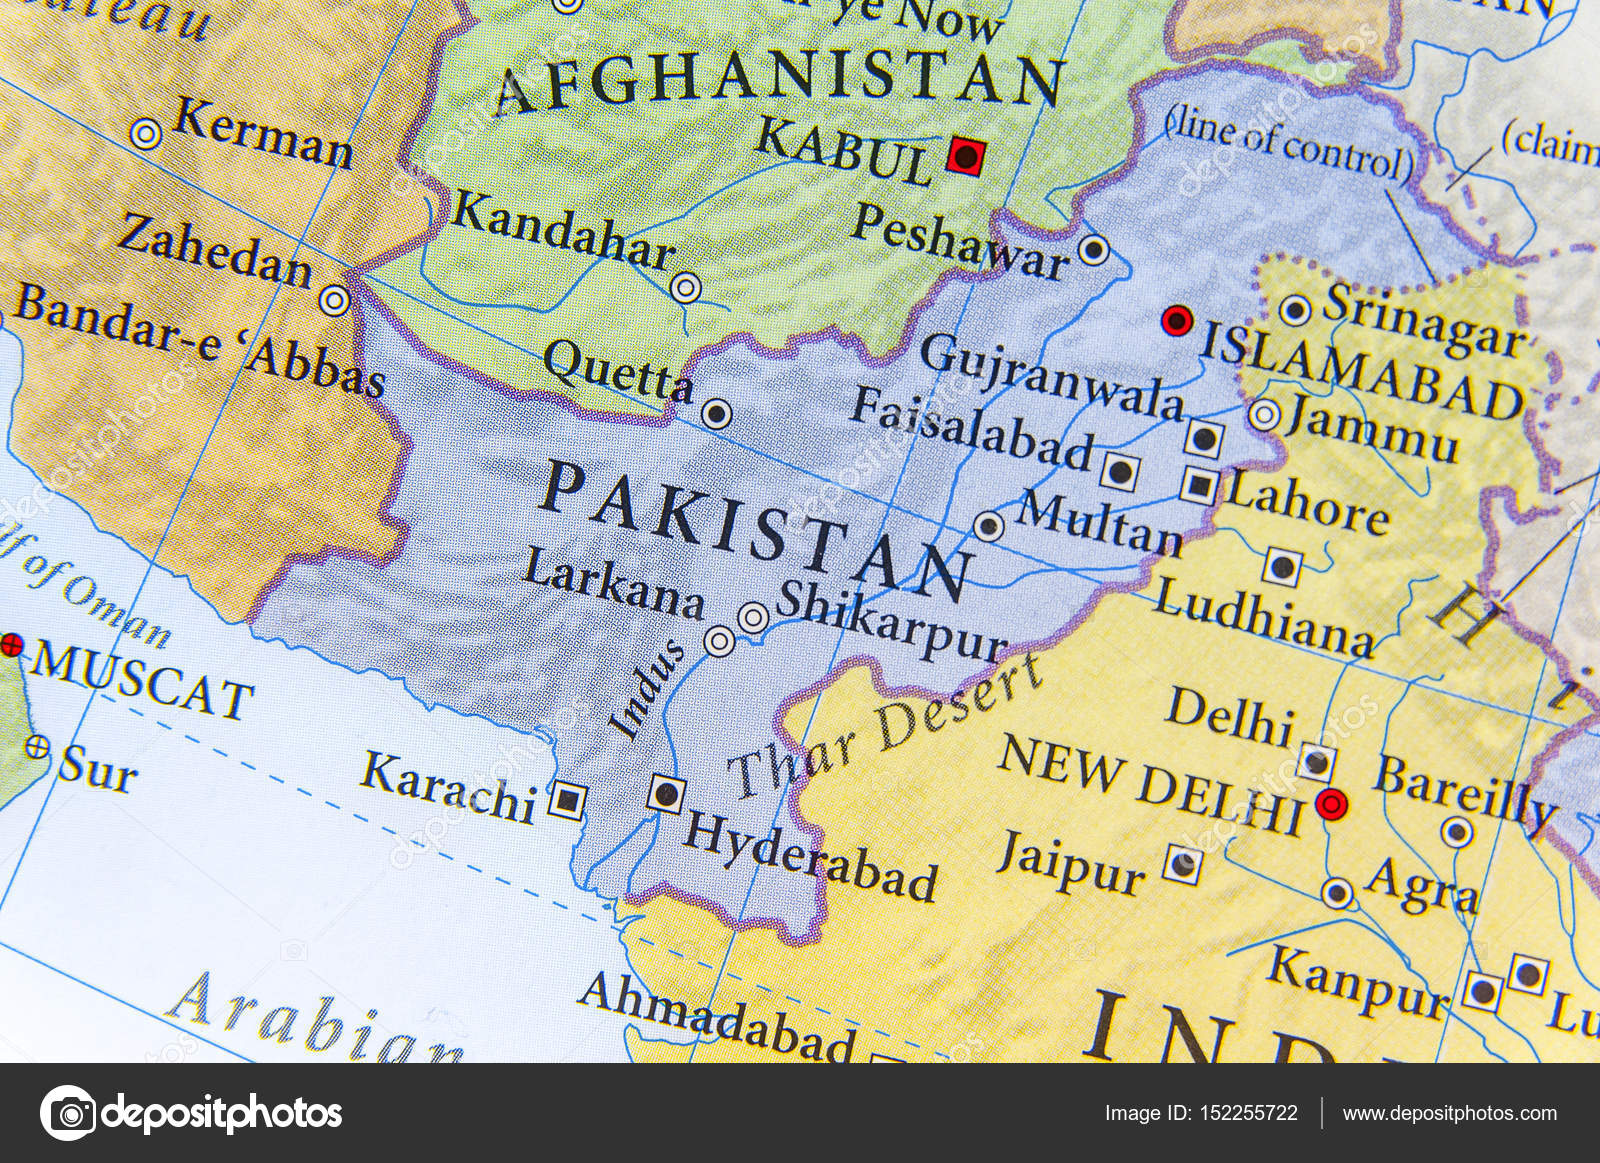 Cartina India Pakistan.Geographic Map Of Pakistan With Important Cities Stock Photo Image By C Bennian 152255722